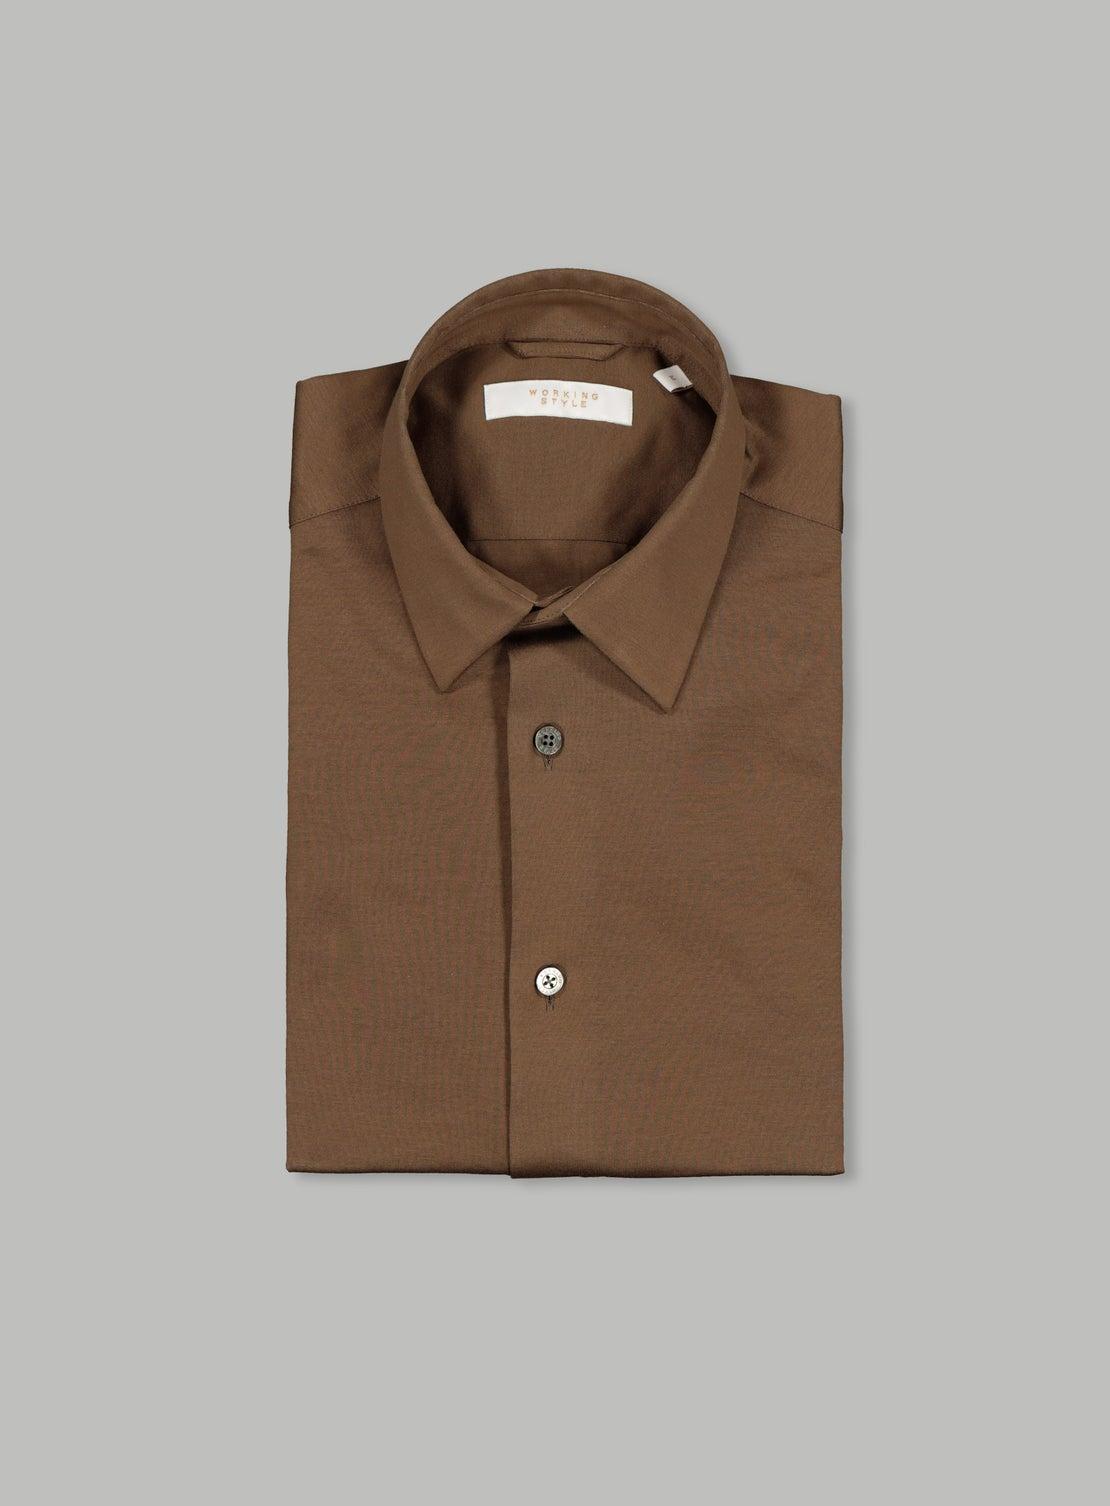 Brown Mercerized Knit Shirt